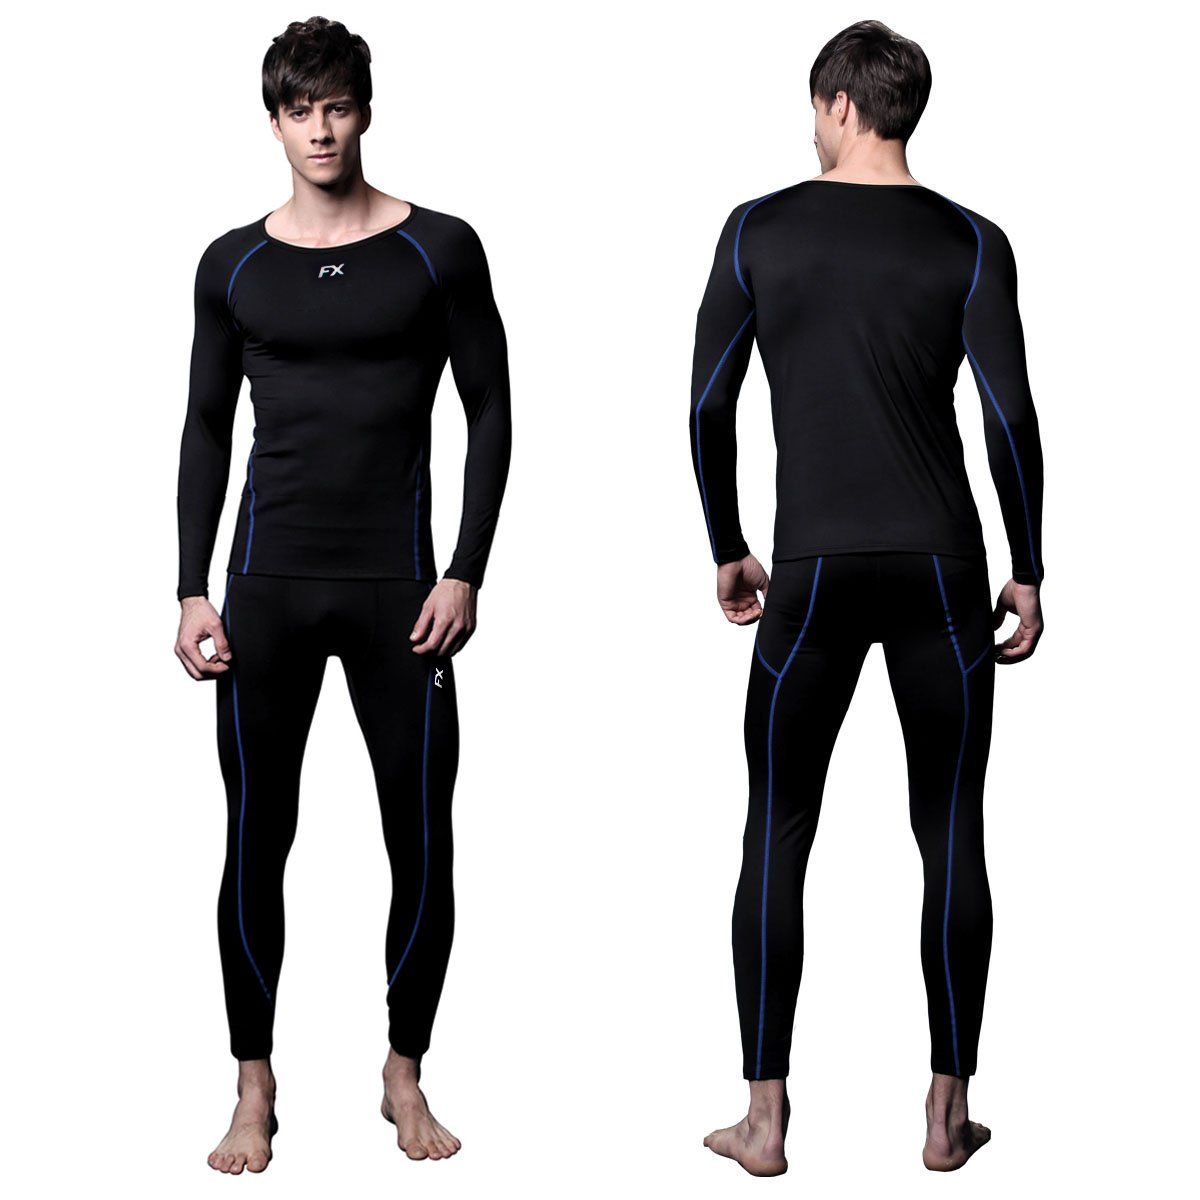 Thermal underwear Guahoo: customer reviews